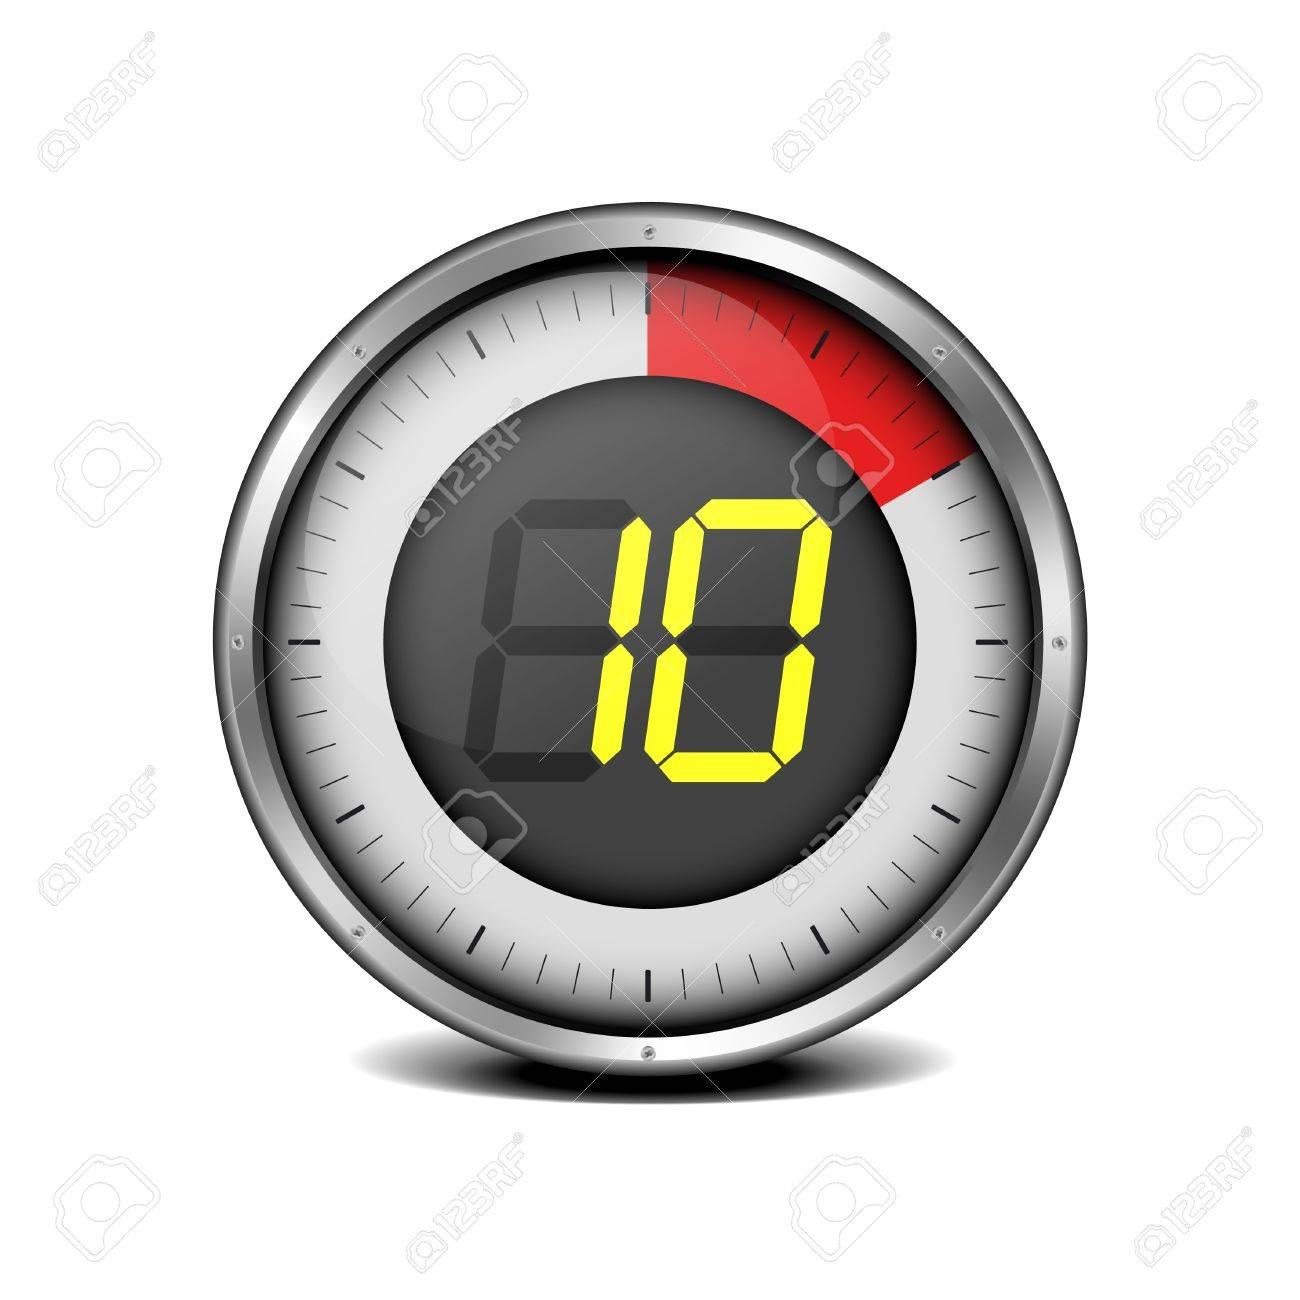 illustration of a metal framed timer with the number 10 - 18689667